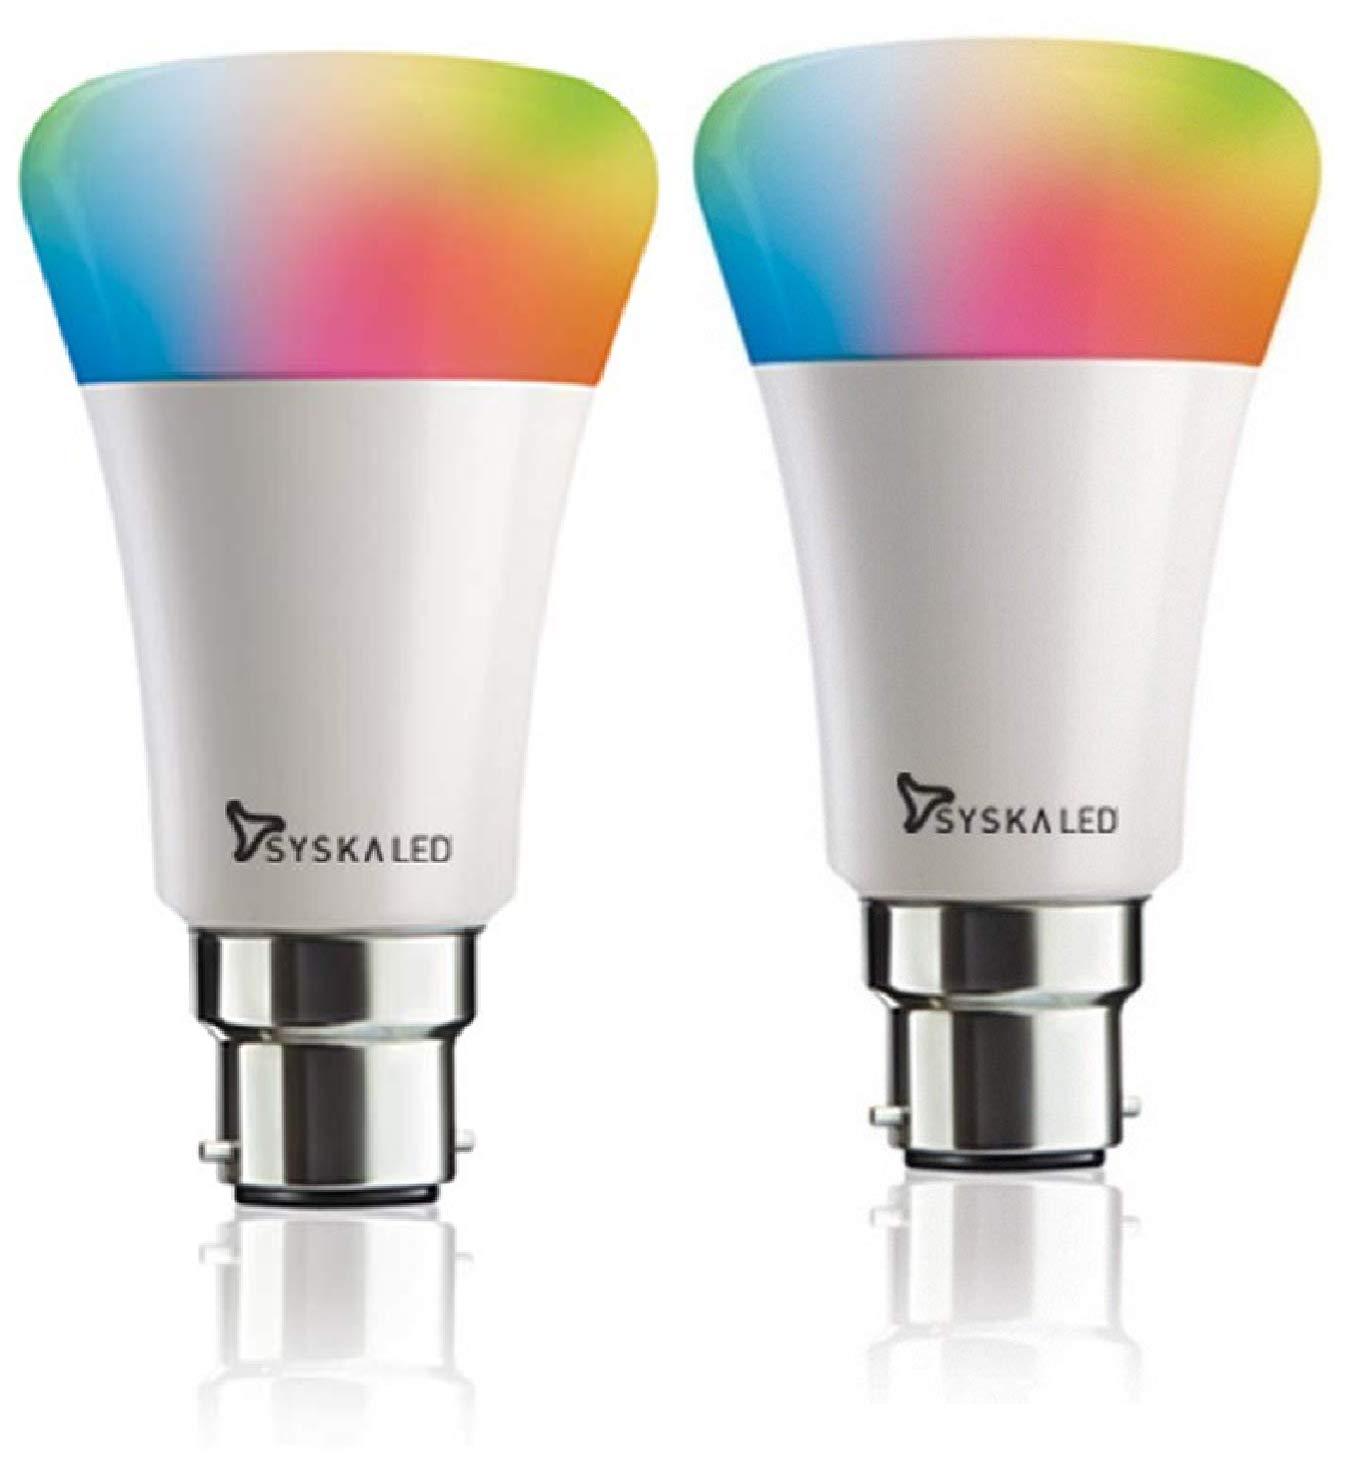 Syska 7-Watt Smart LED Bulb